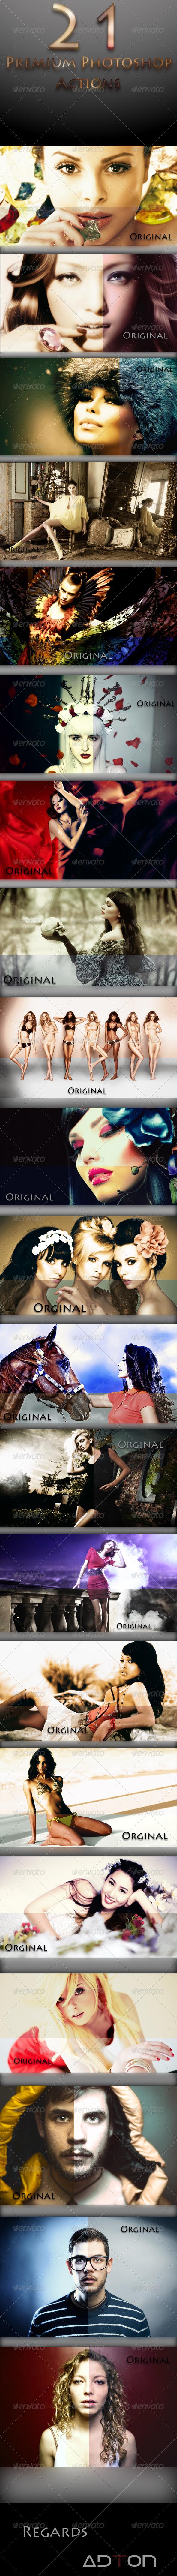 GraphicRiver 21 Premium Photoshop Actions 7754355